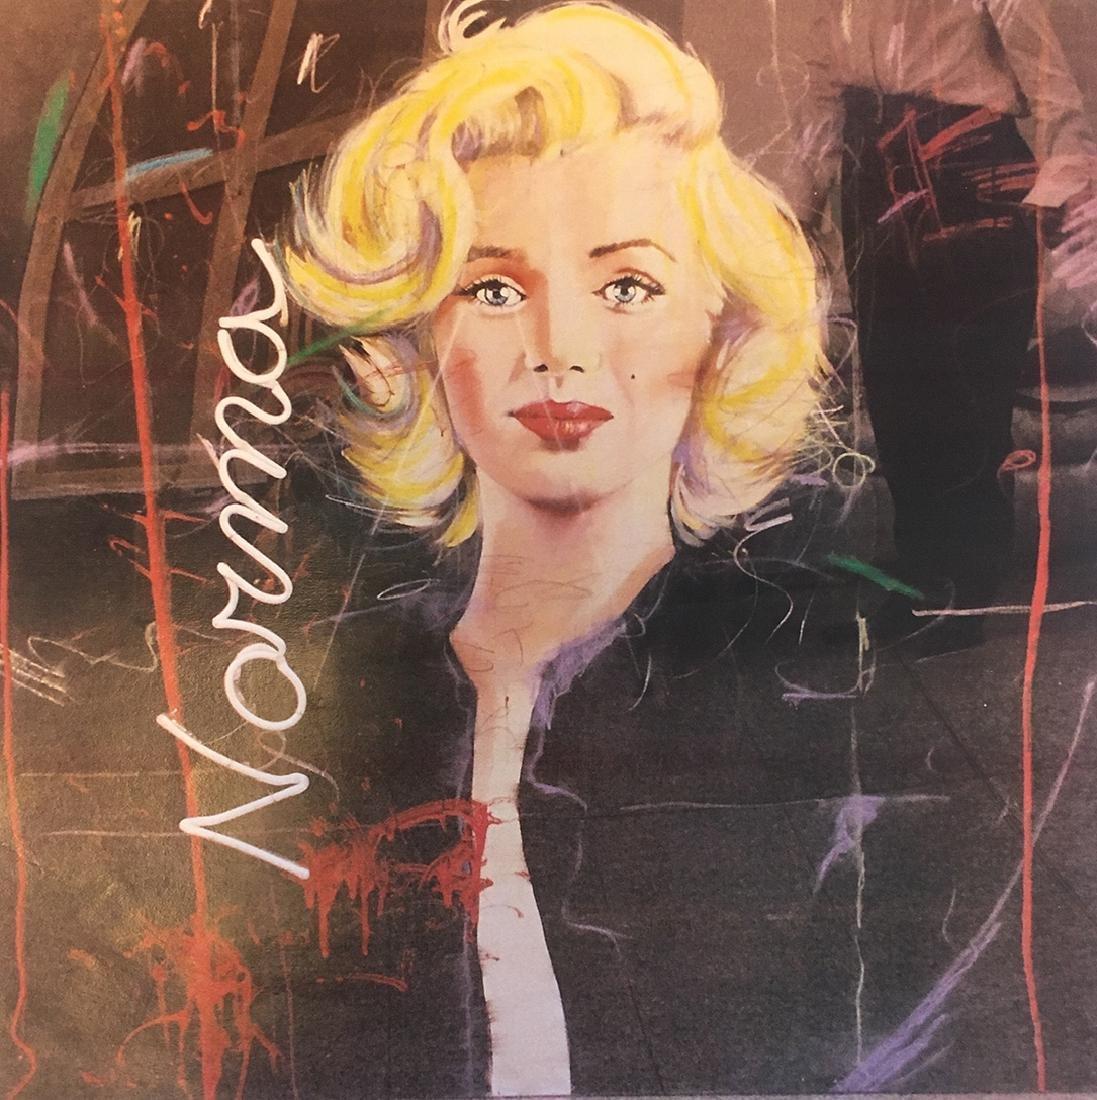 Enrico Manera, 2005, Marilyn Monroe